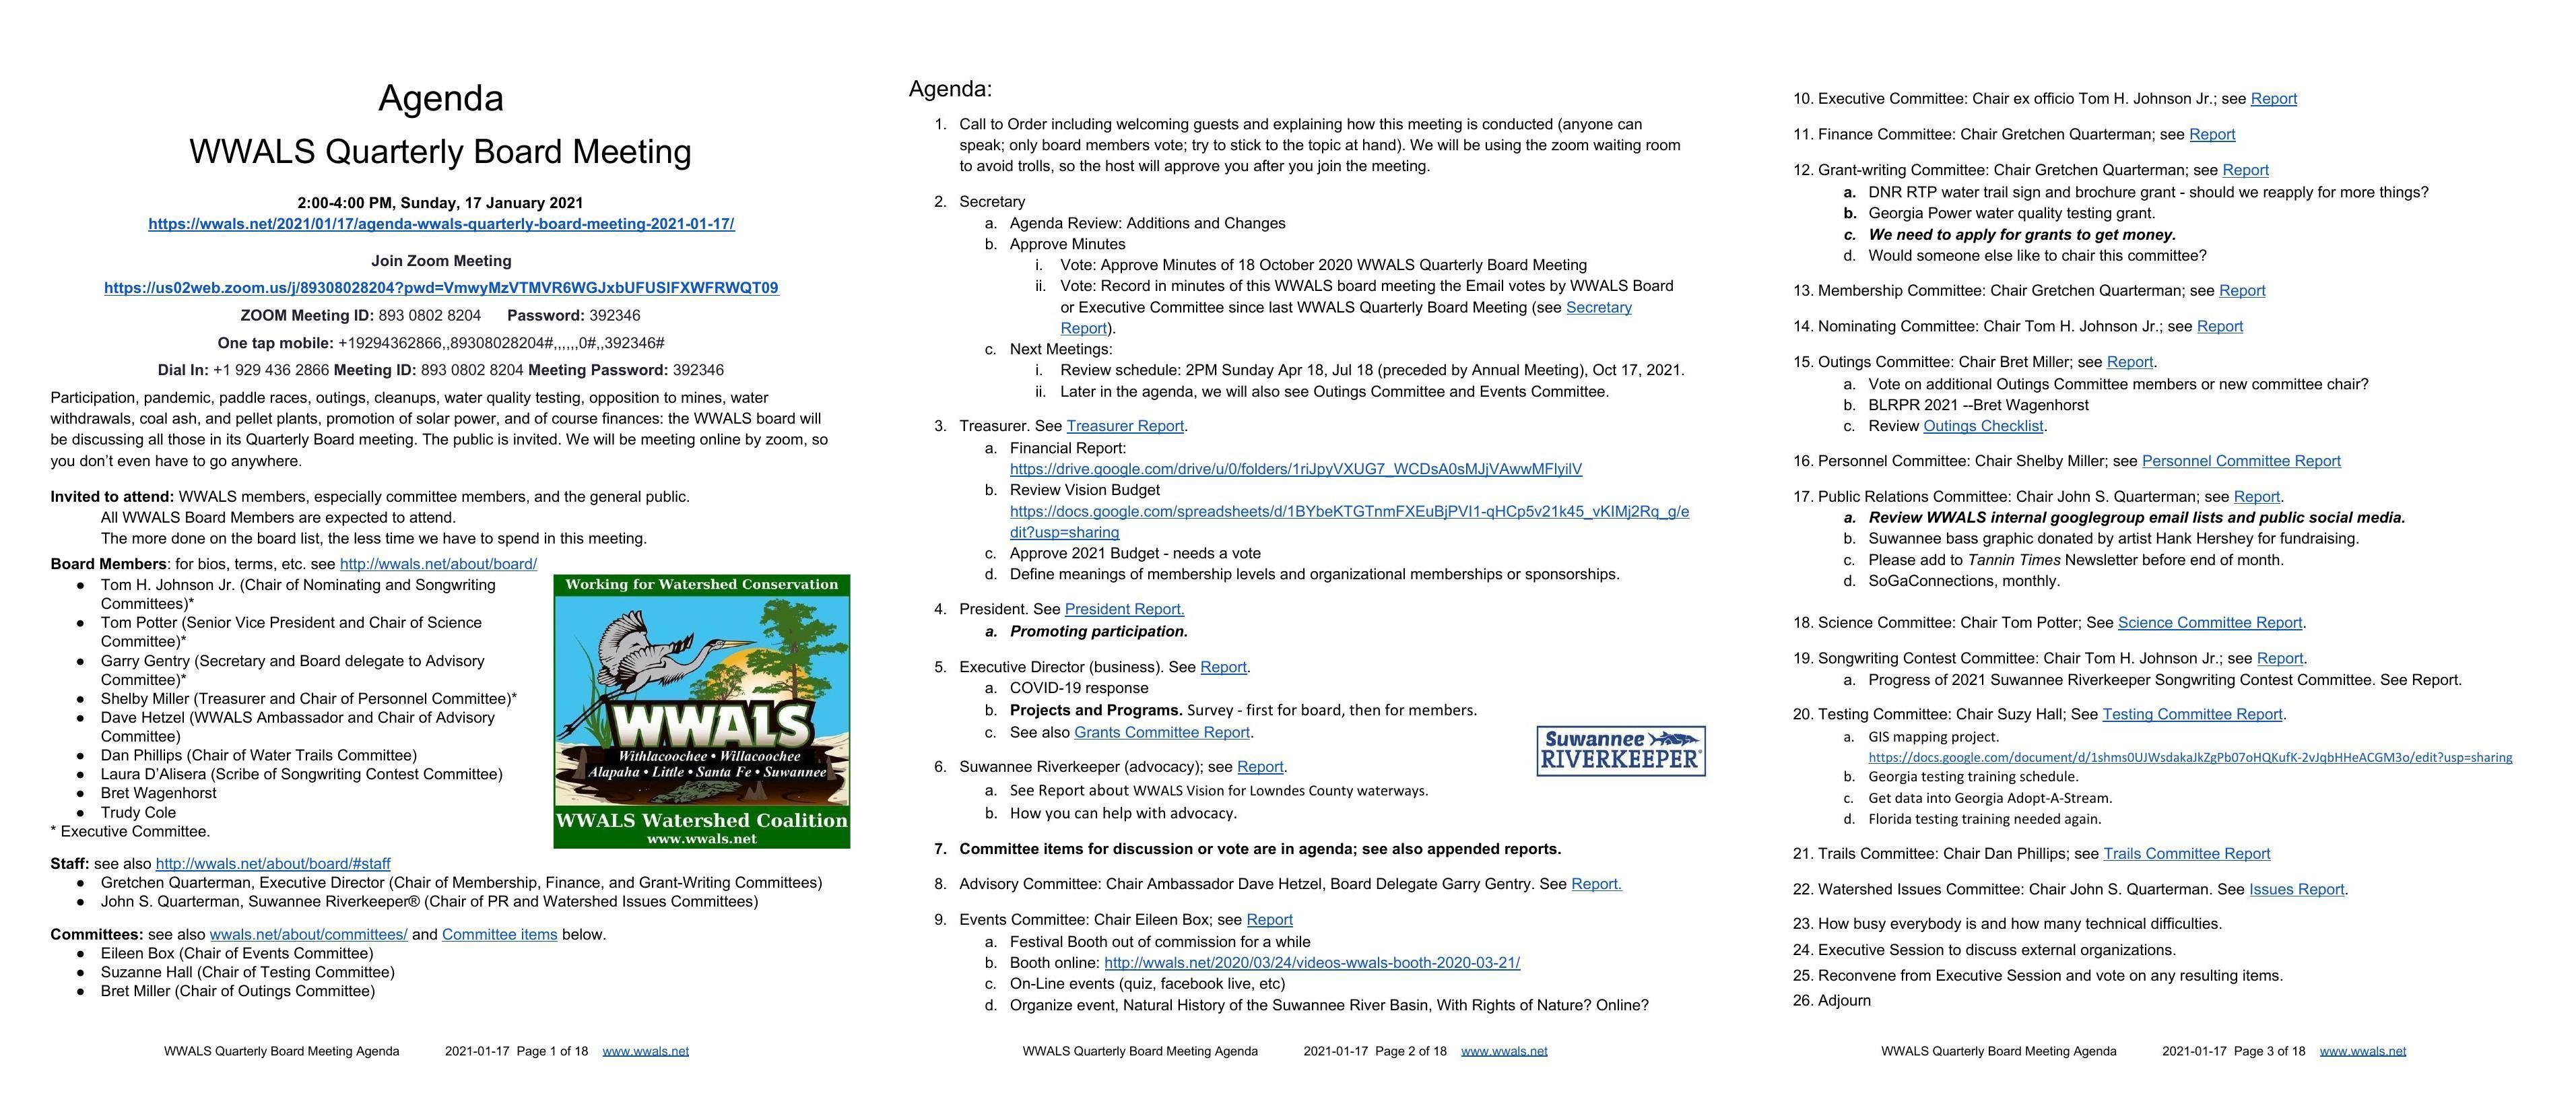 [Three-page agenda]